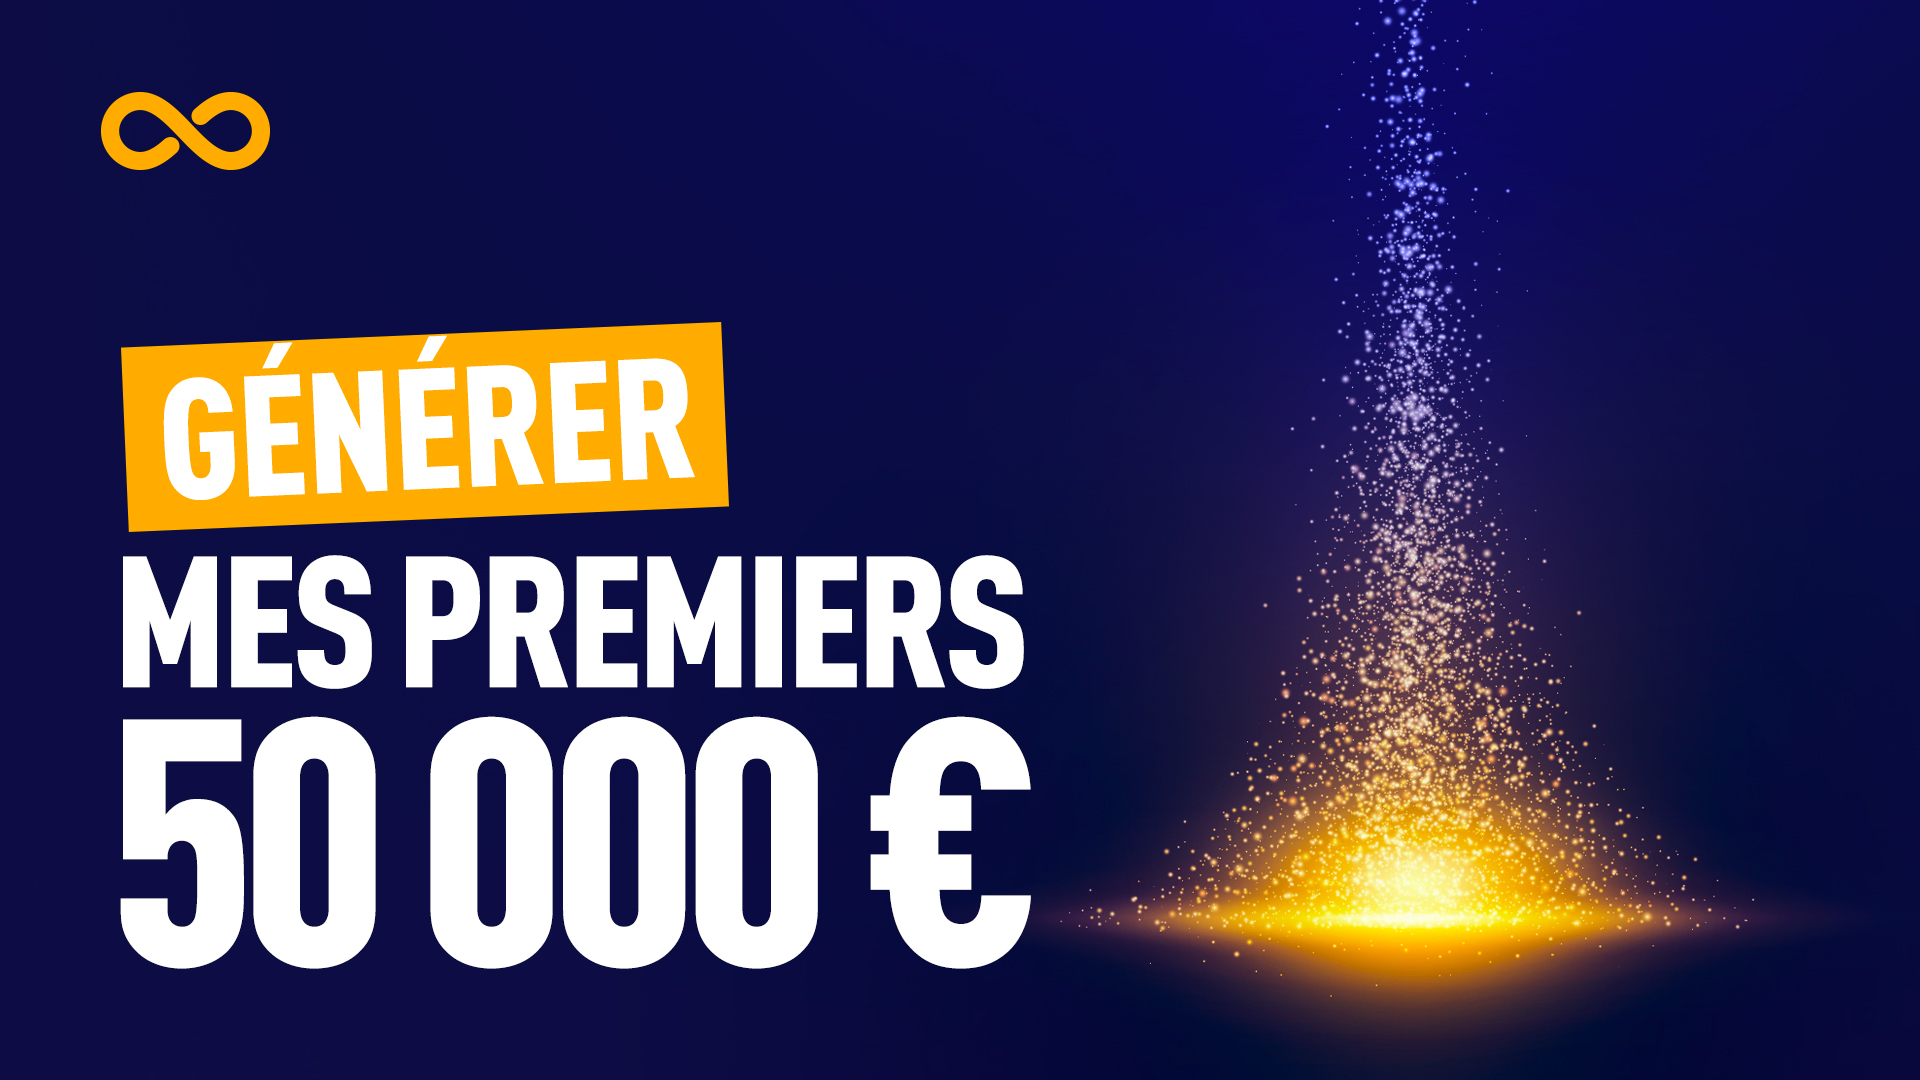 générer mes premiers 50 000euros